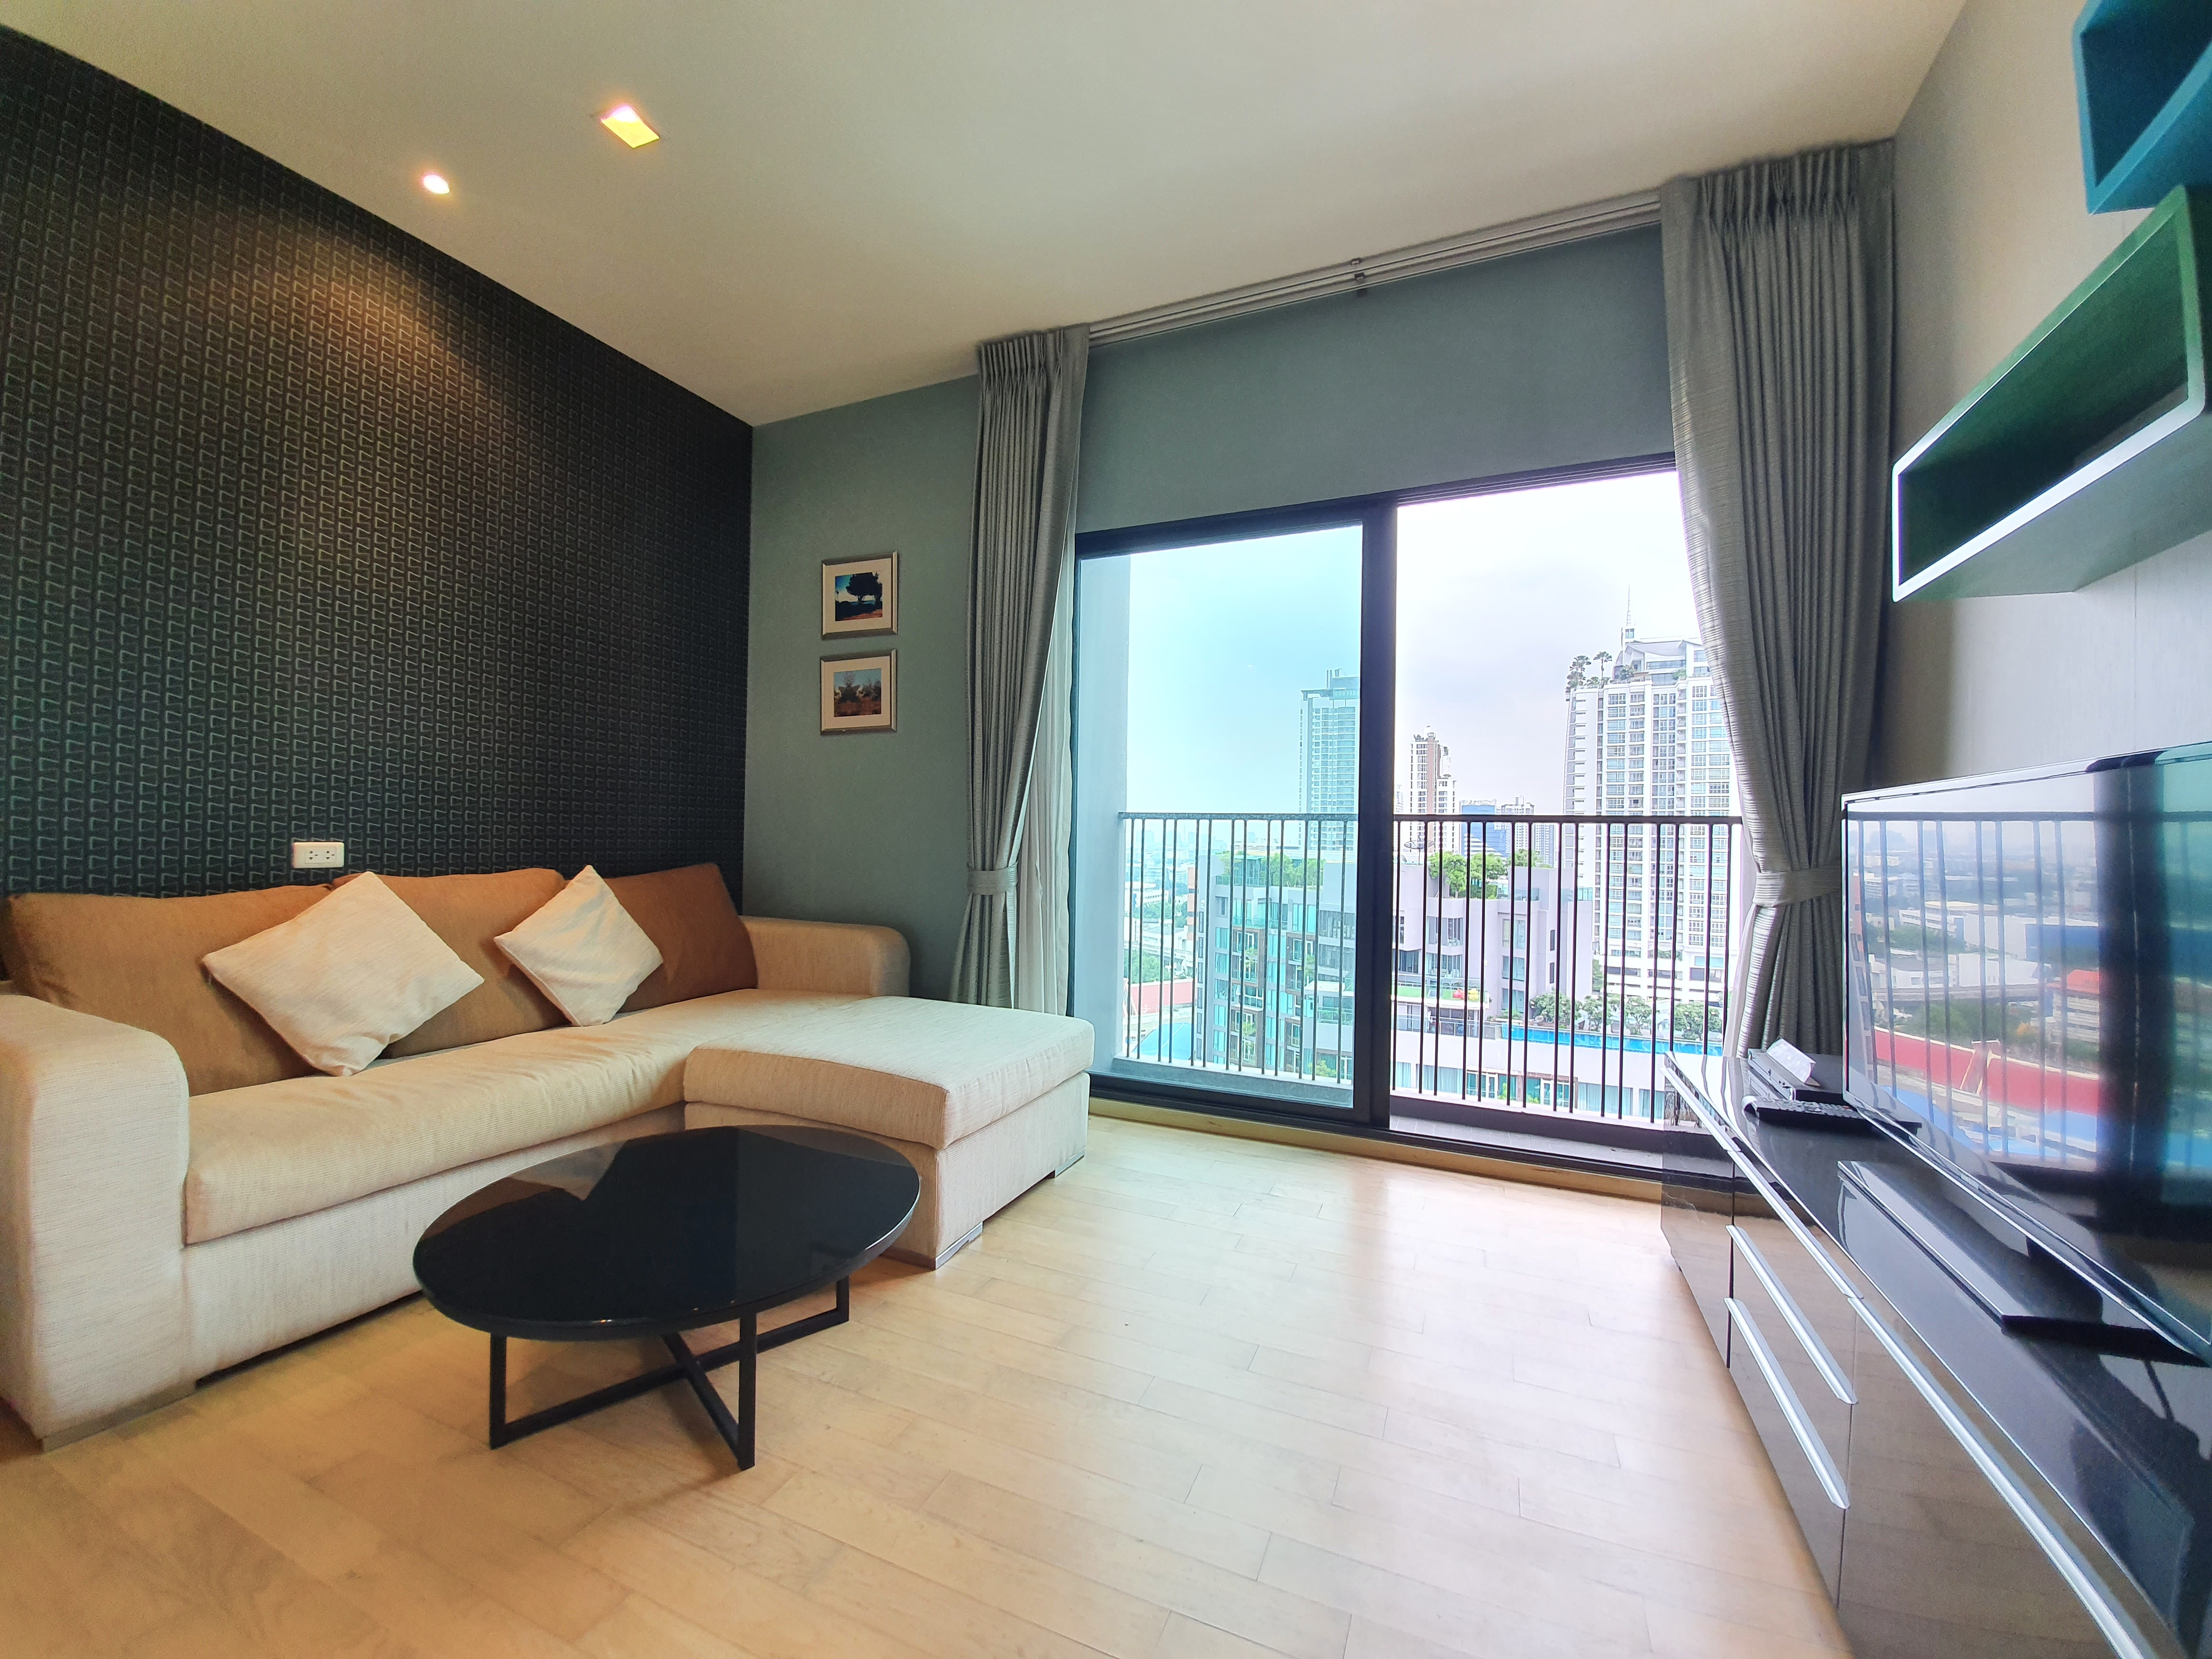 Noble Reveal 1 Bedroom Unit For Rent (Near Ekamai BTS)